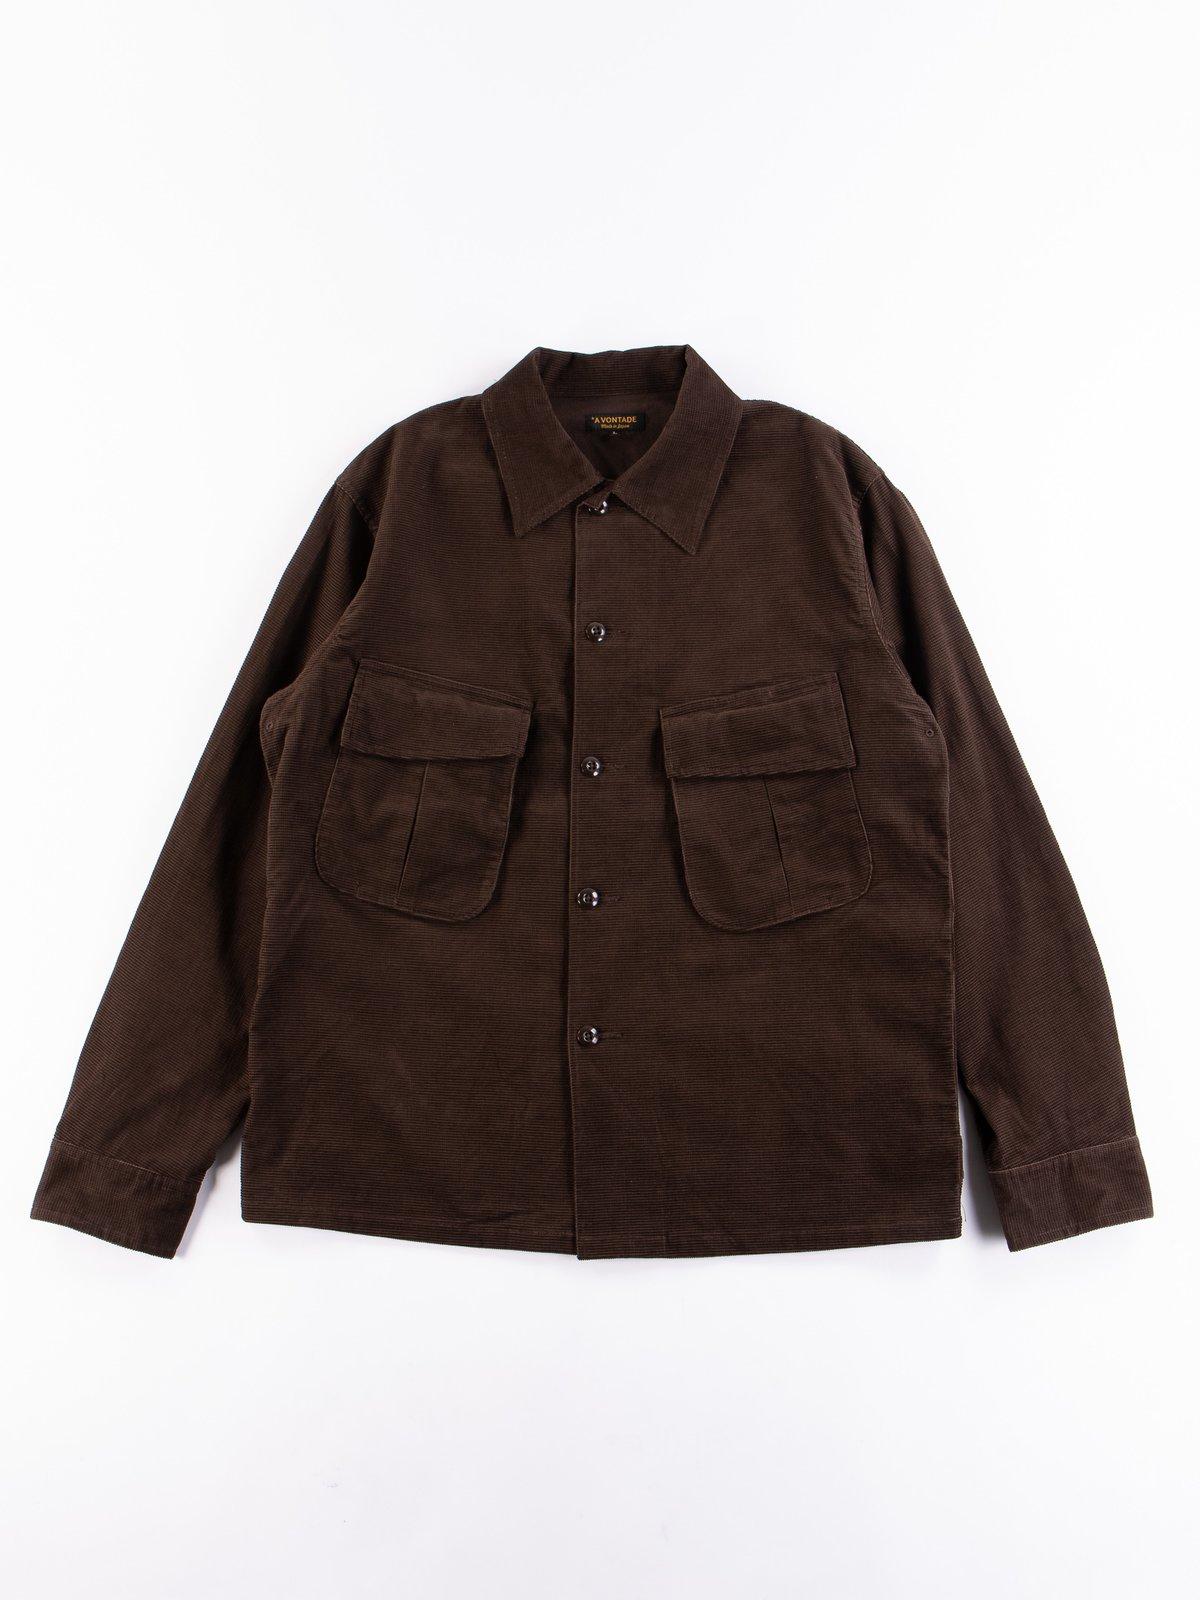 Dark Brown Dobby Caramel Corduroy Combat Short Jacket - Image 1